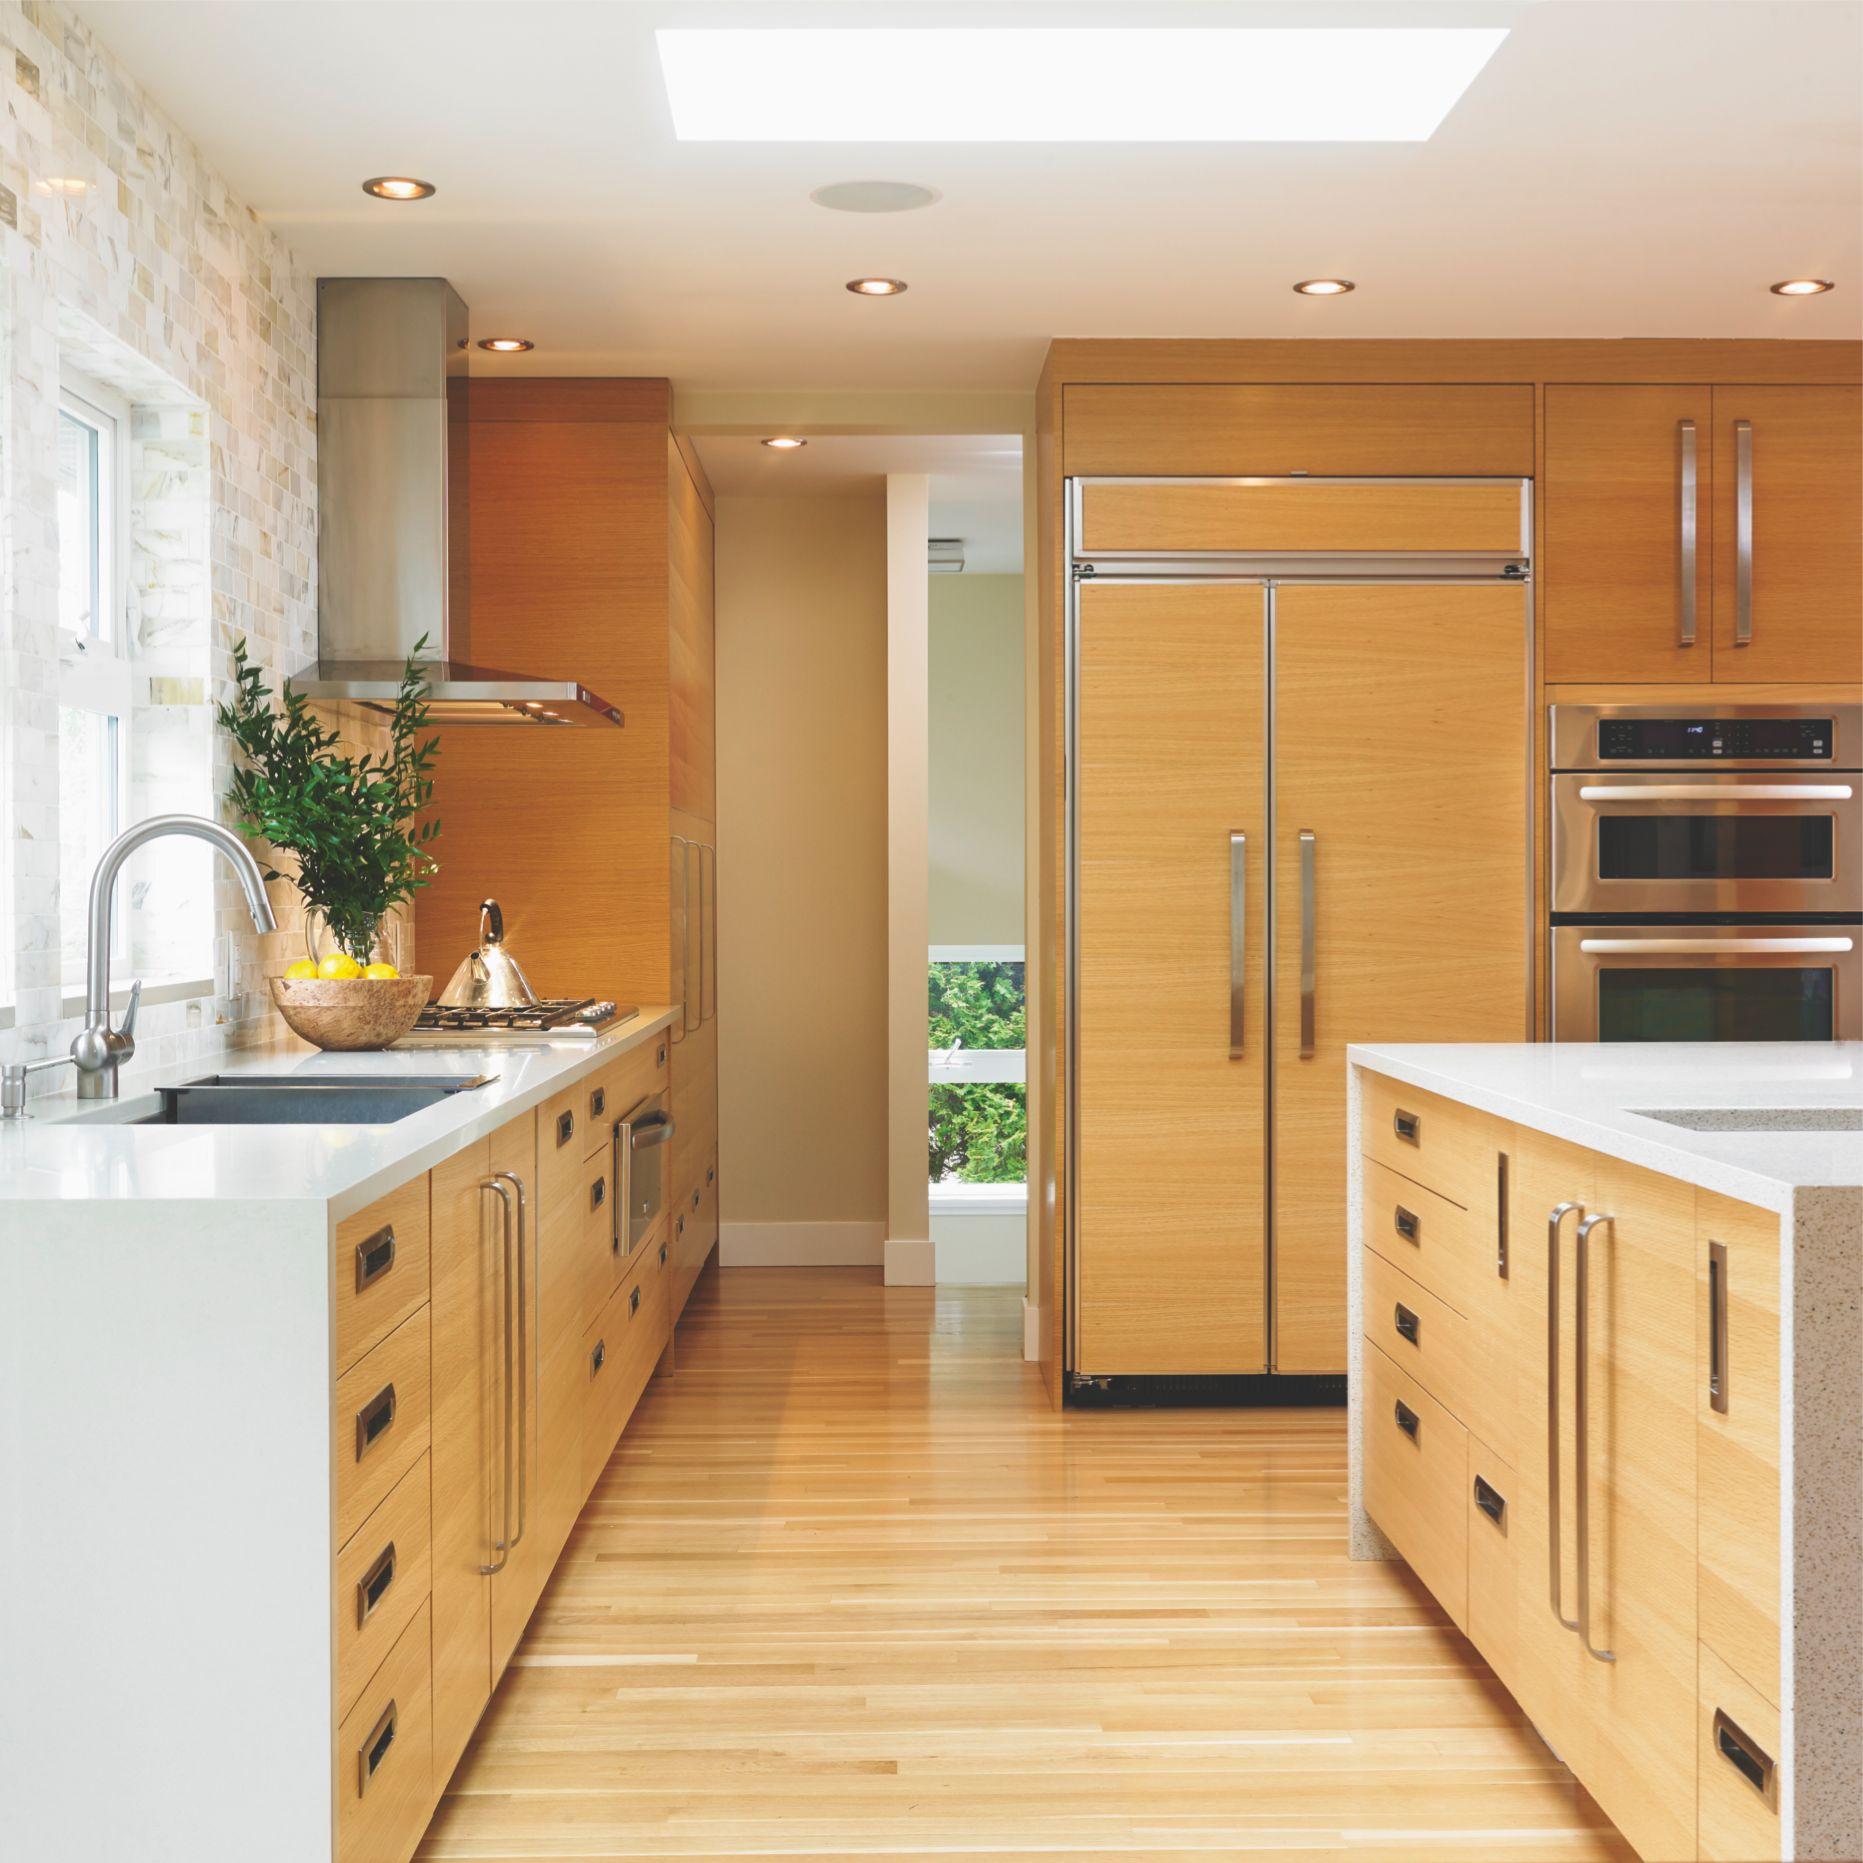 Pisos de madera dise o de interiores el universal cartagena el universal cartagena - Disenos de pisos para interiores ...